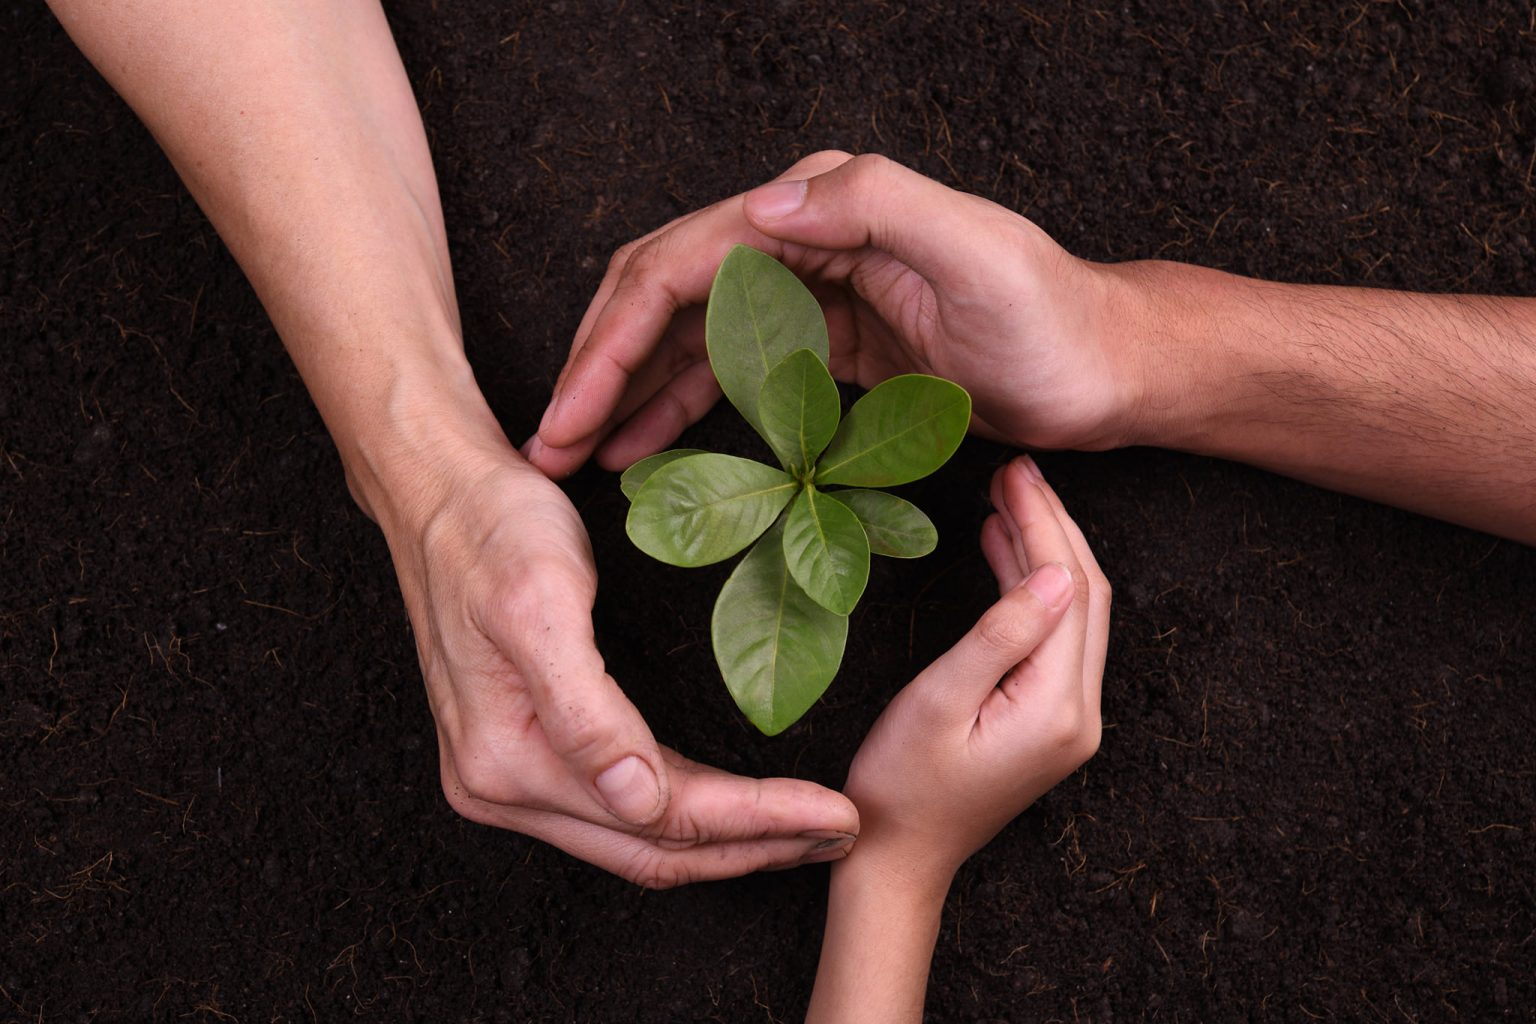 hands-protect-plant-7WPSVUN-re-1536x1024